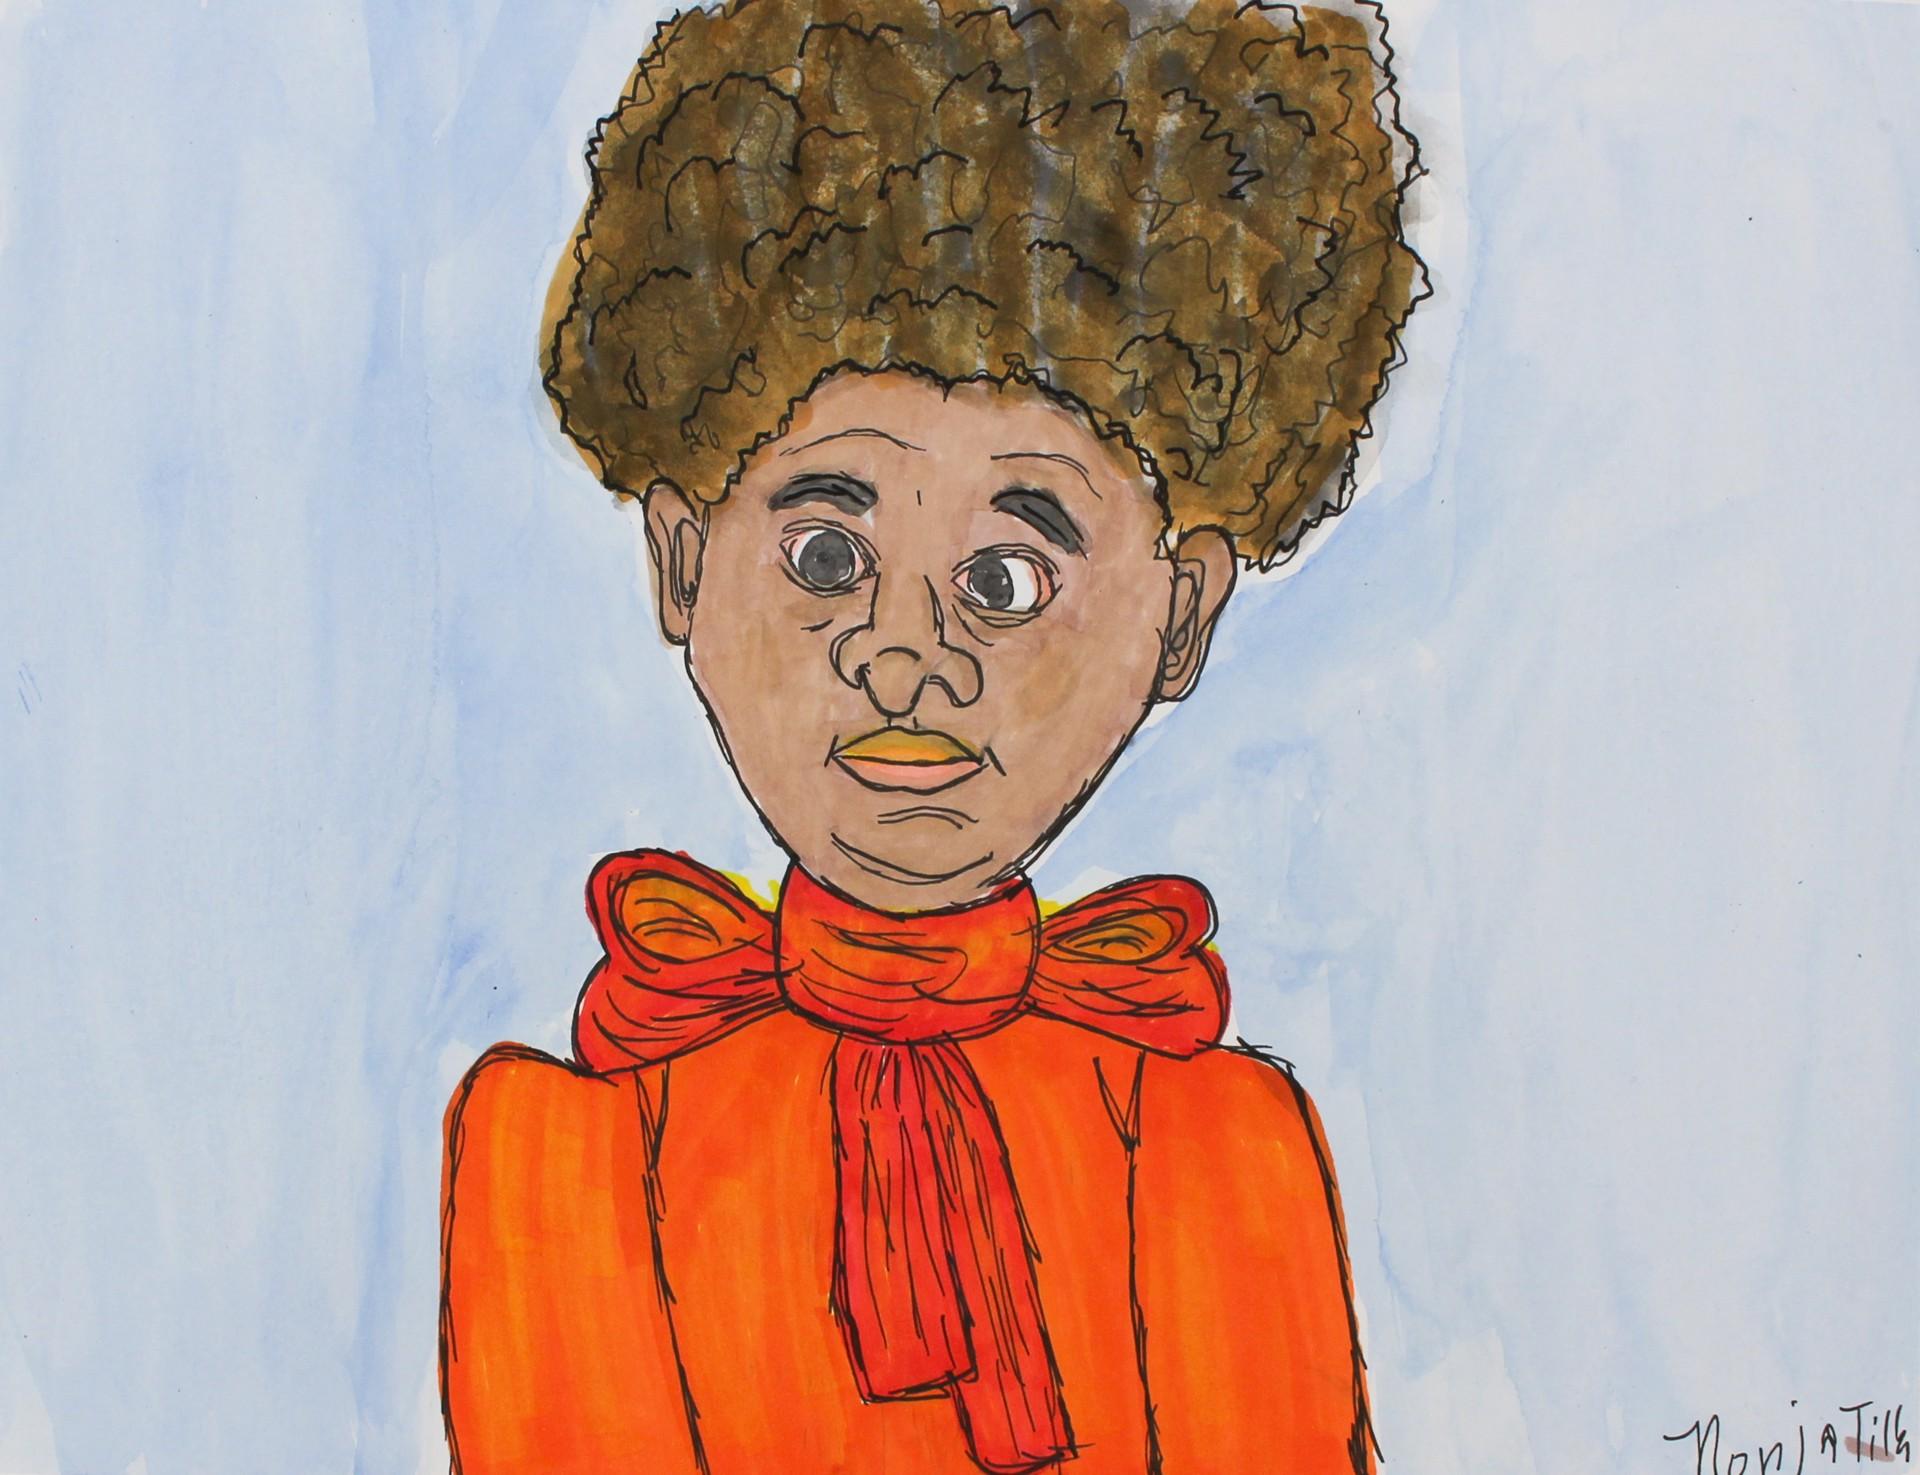 My Childhood Memory by Nonja Tiller